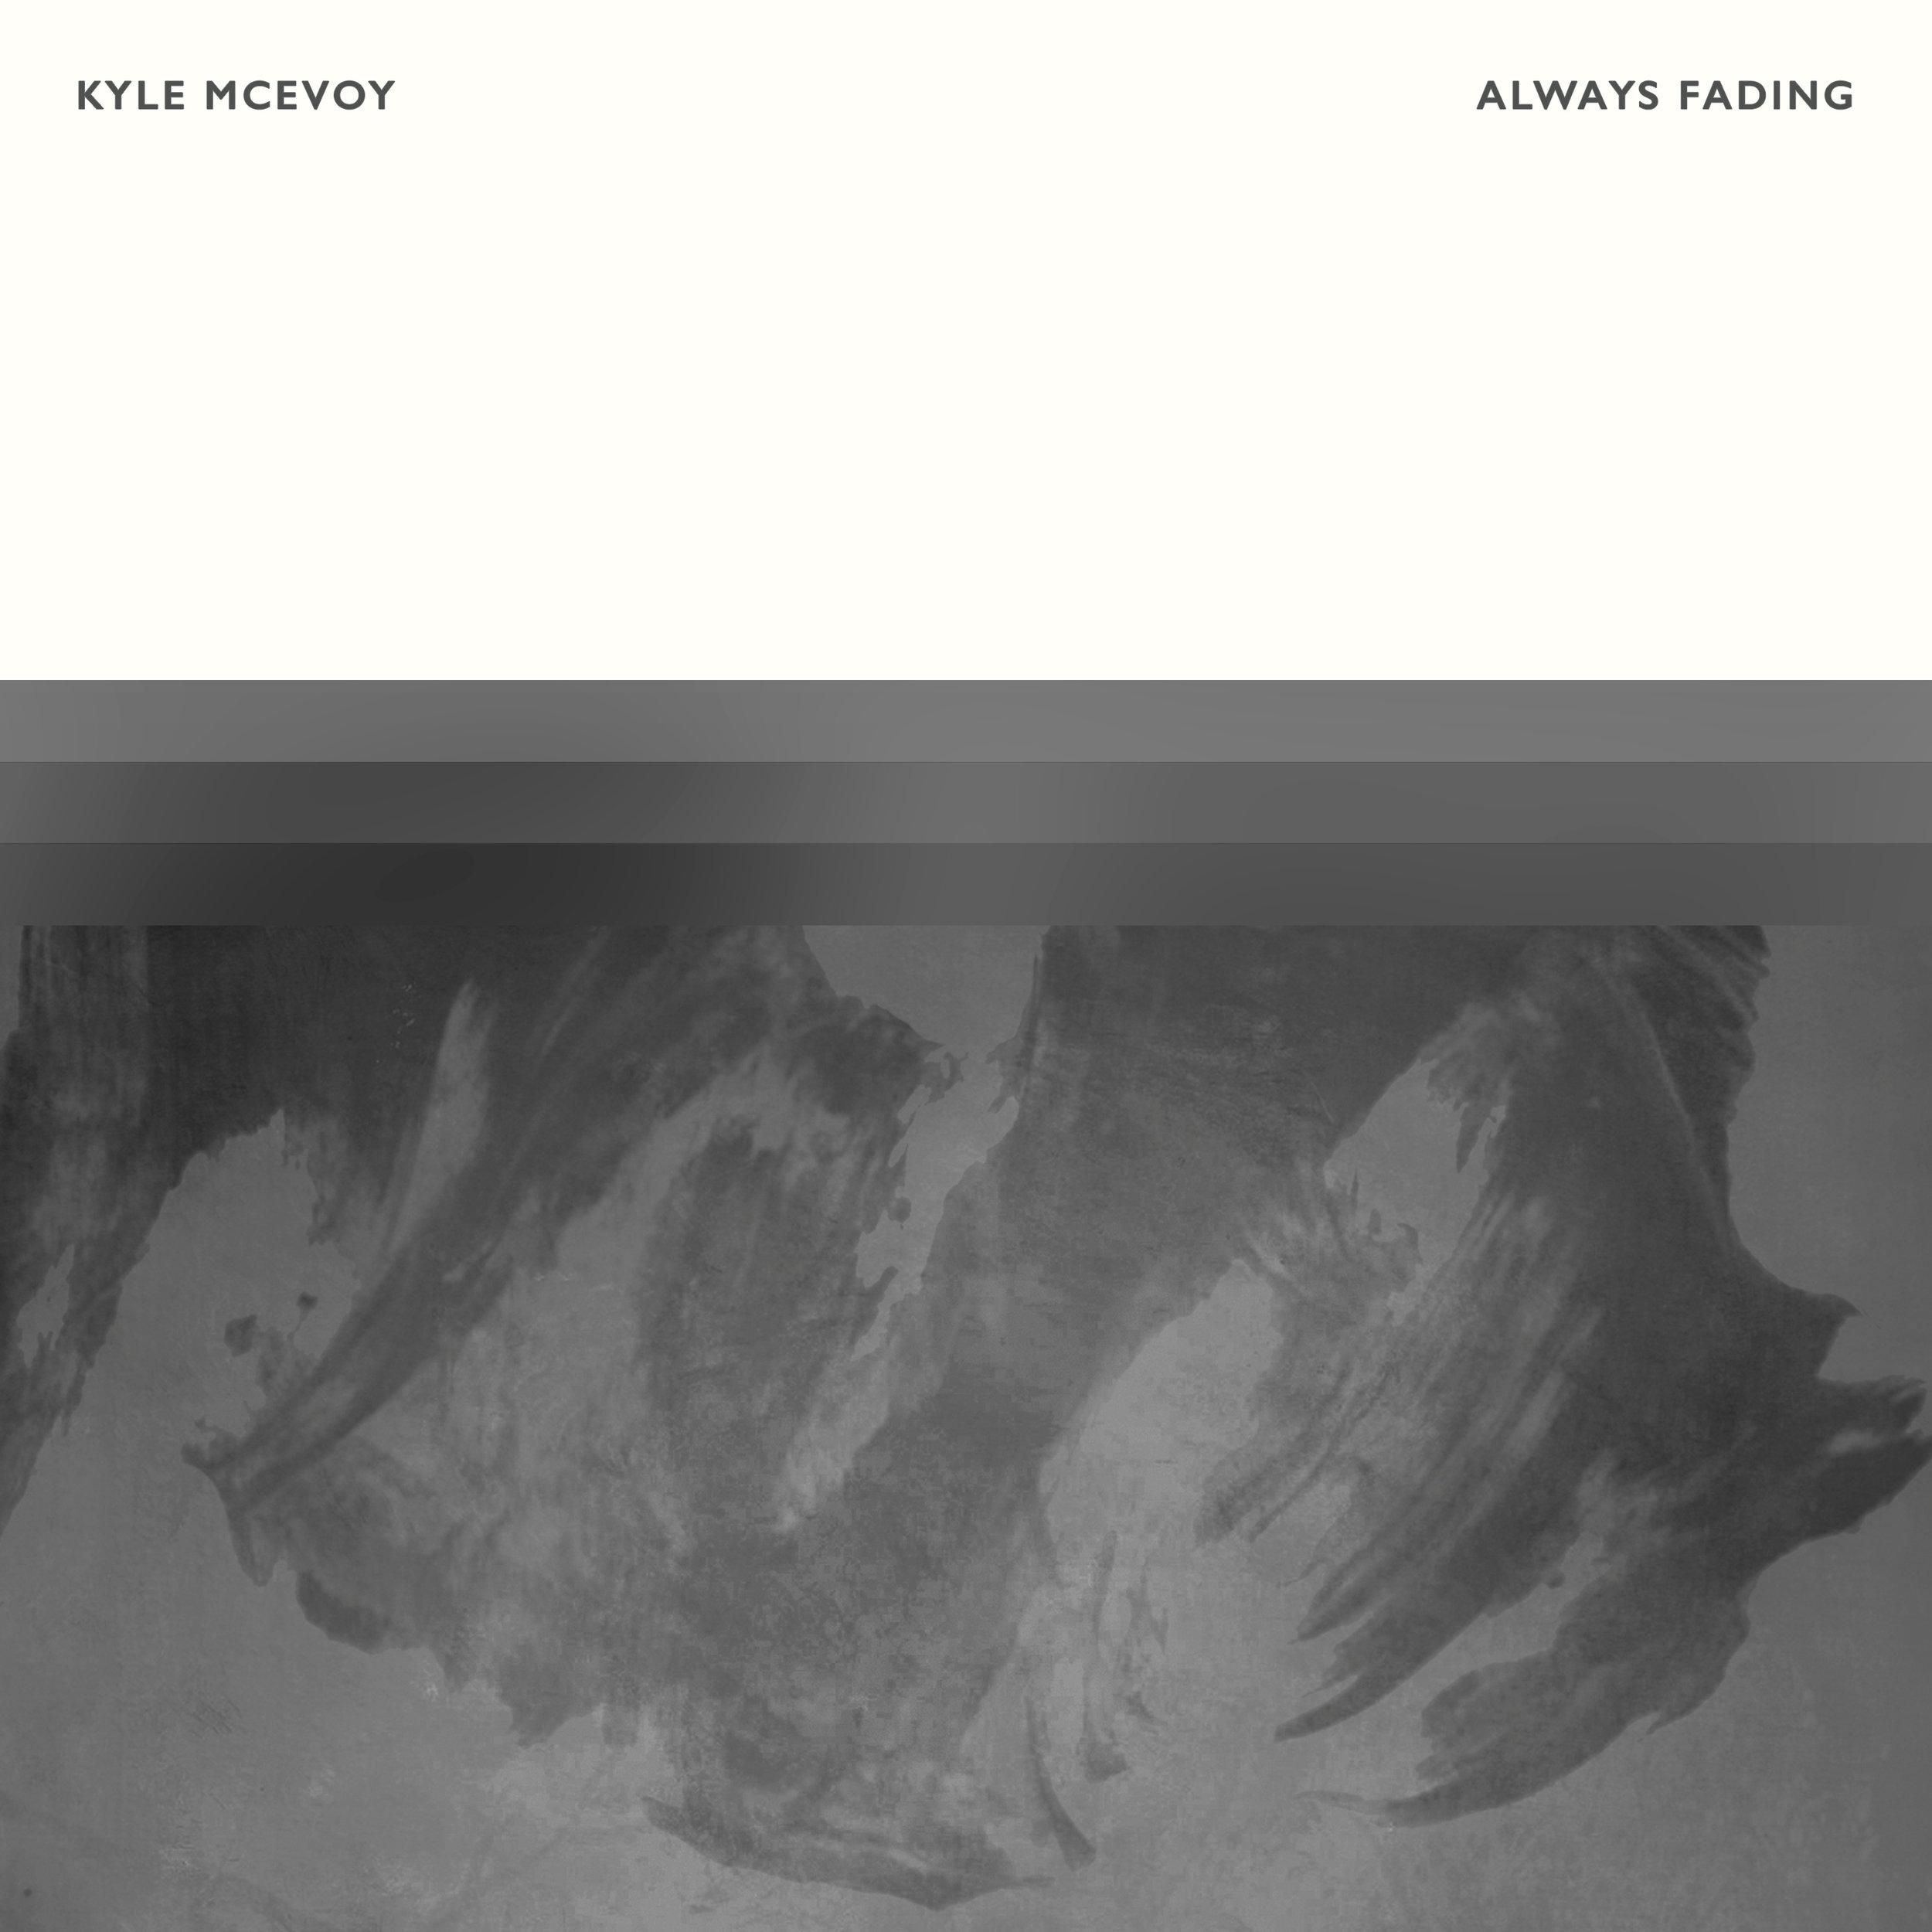 Kyle McEvoy - Always Fading